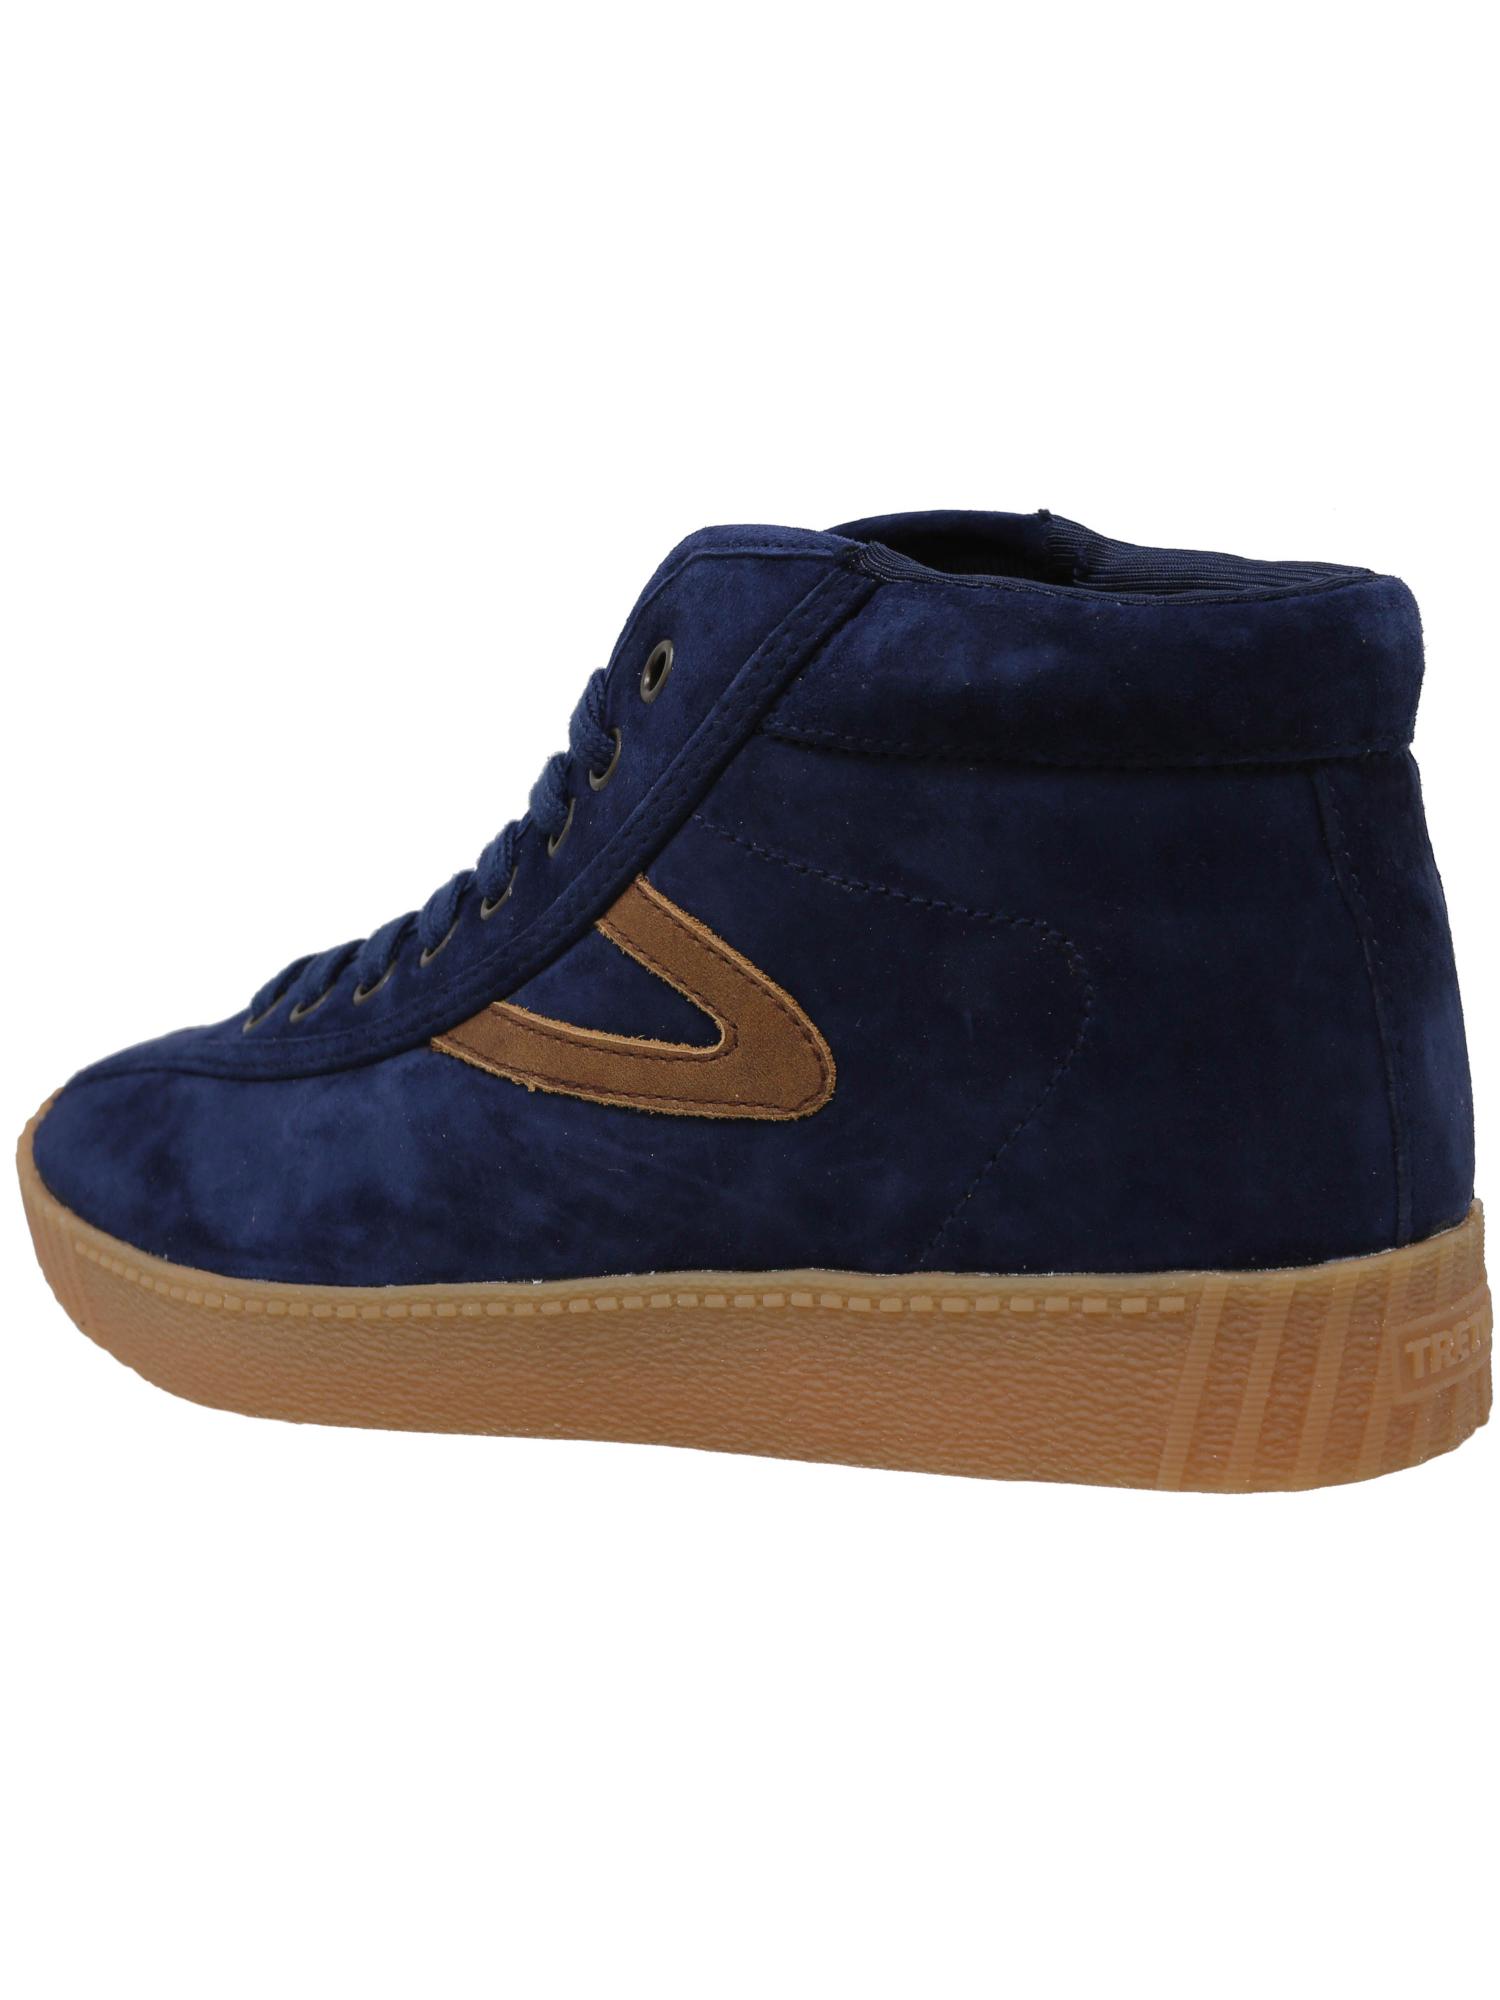 a567451e223c ... Picture 3 of 3. Tretorn Men s Nylite Hi 7 Suede High-Top Fashion Sneaker